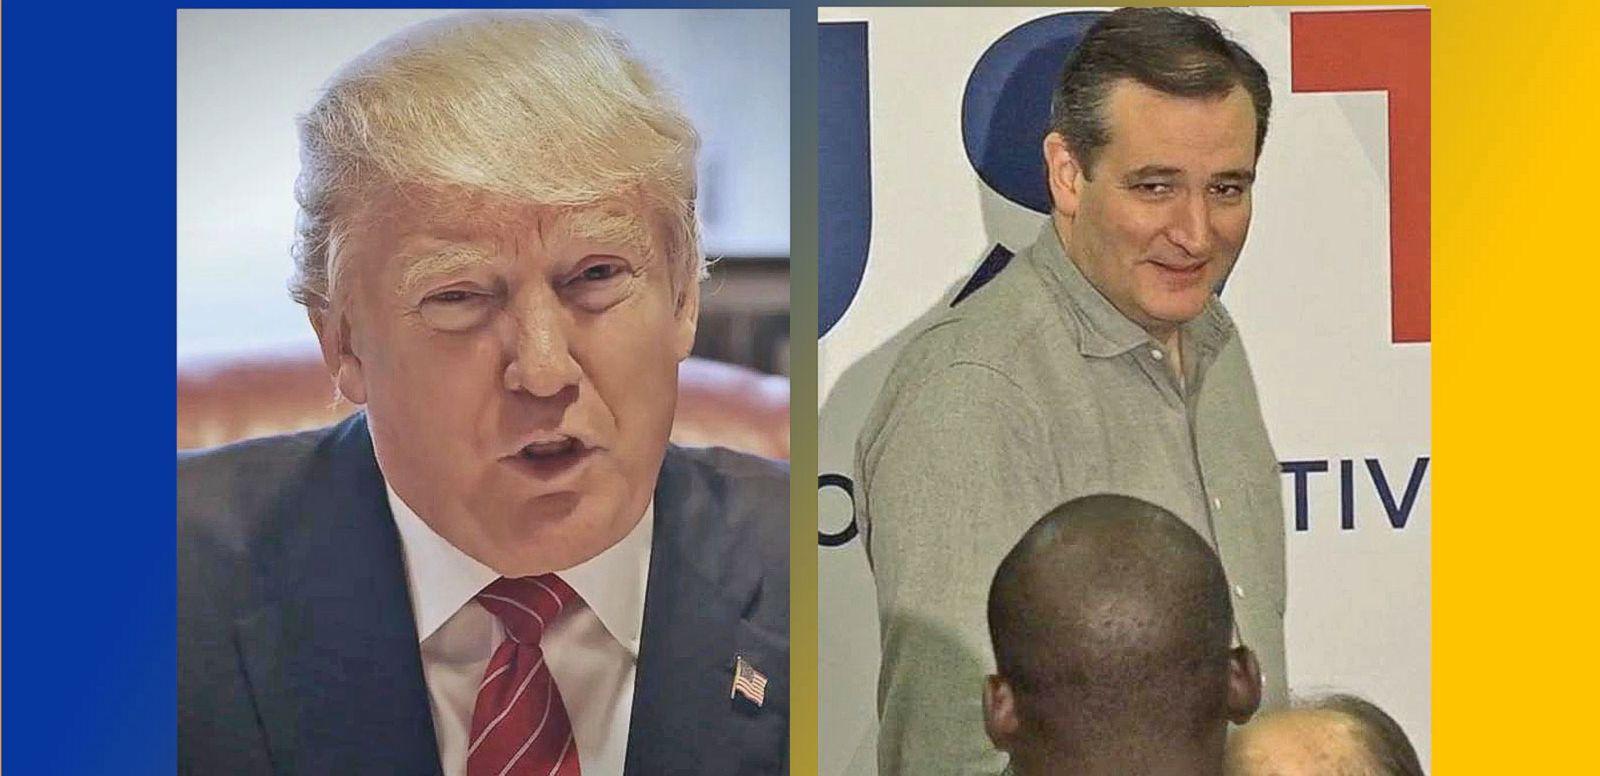 VIDEO: Republicans Prepare to Debate Ahead of New Hampshire Primary